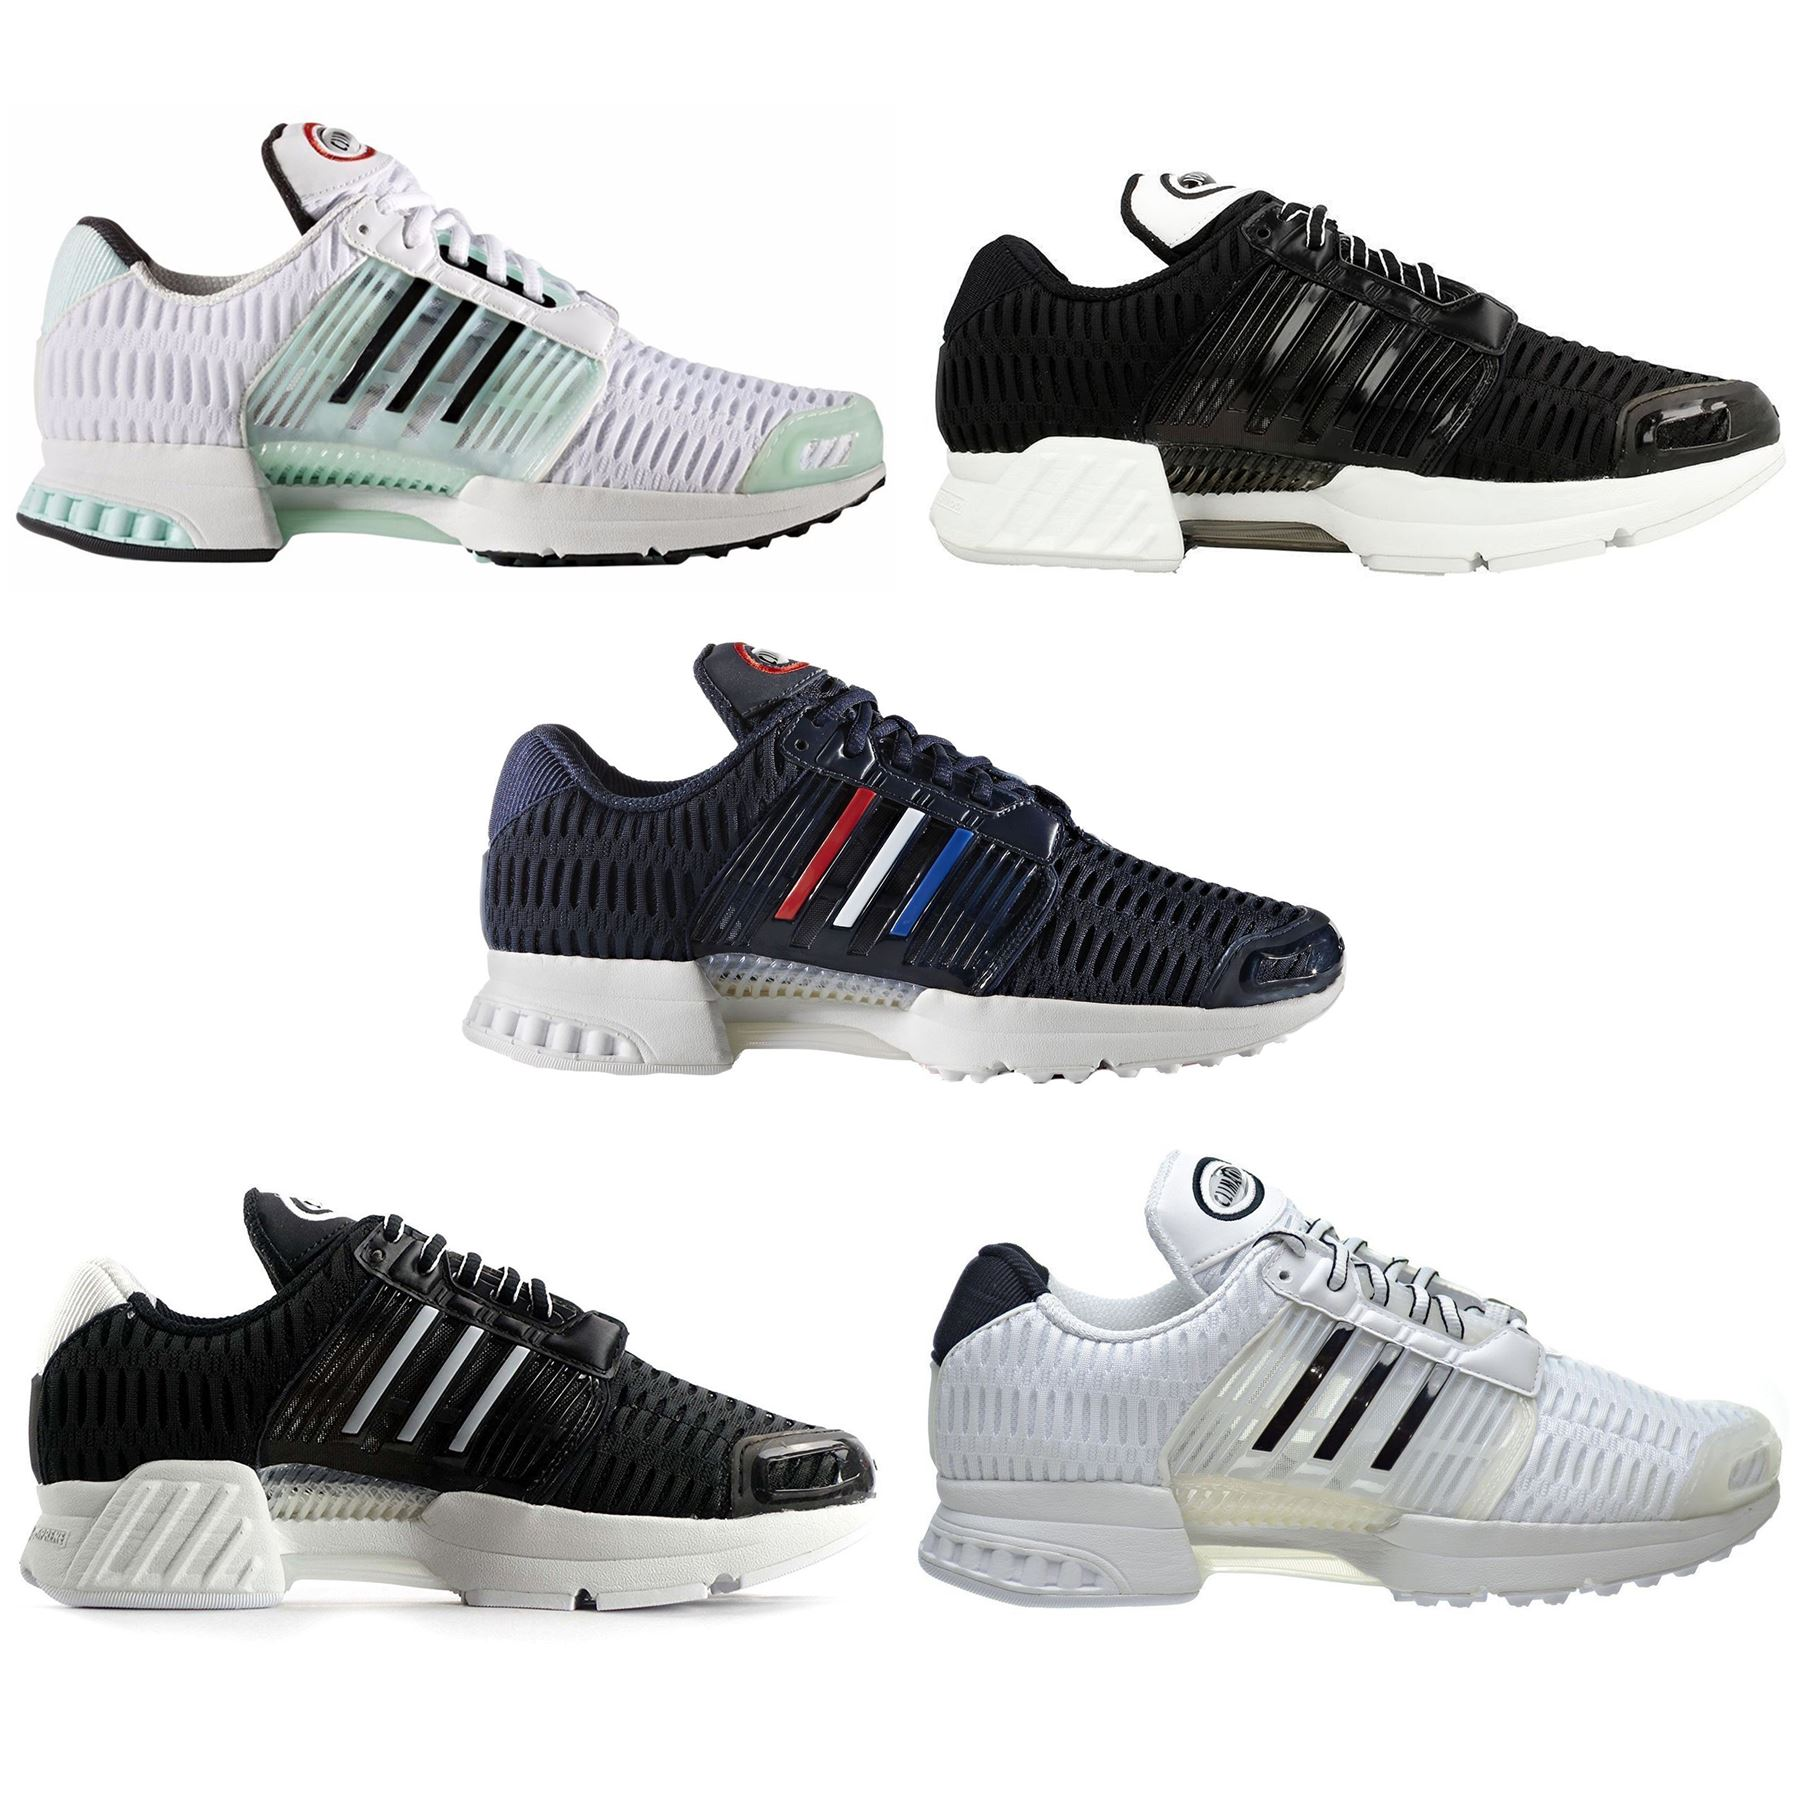 Turnschuhe Cool Original Junior Details Zu Sneaker Adidas Damen Schuhe Herren Klima v8wN0Onm